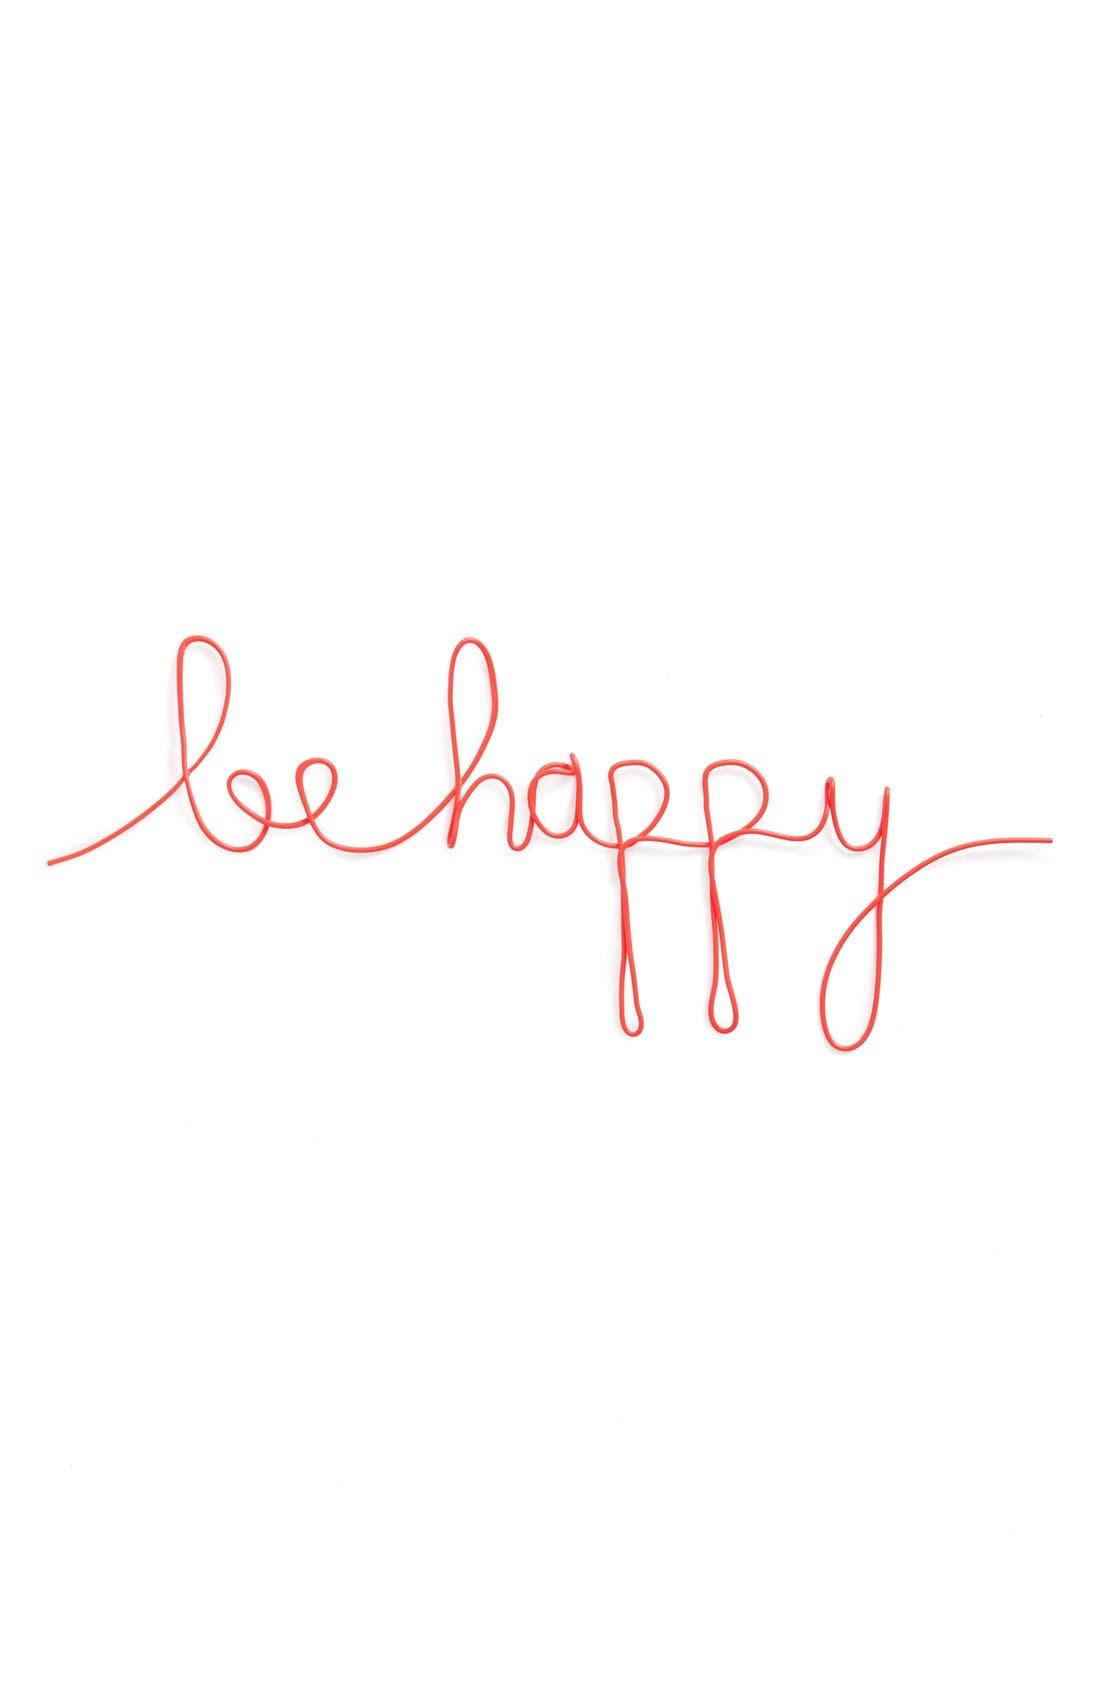 Main Image - Natural Life 'Be Happy' Wire Wall Art